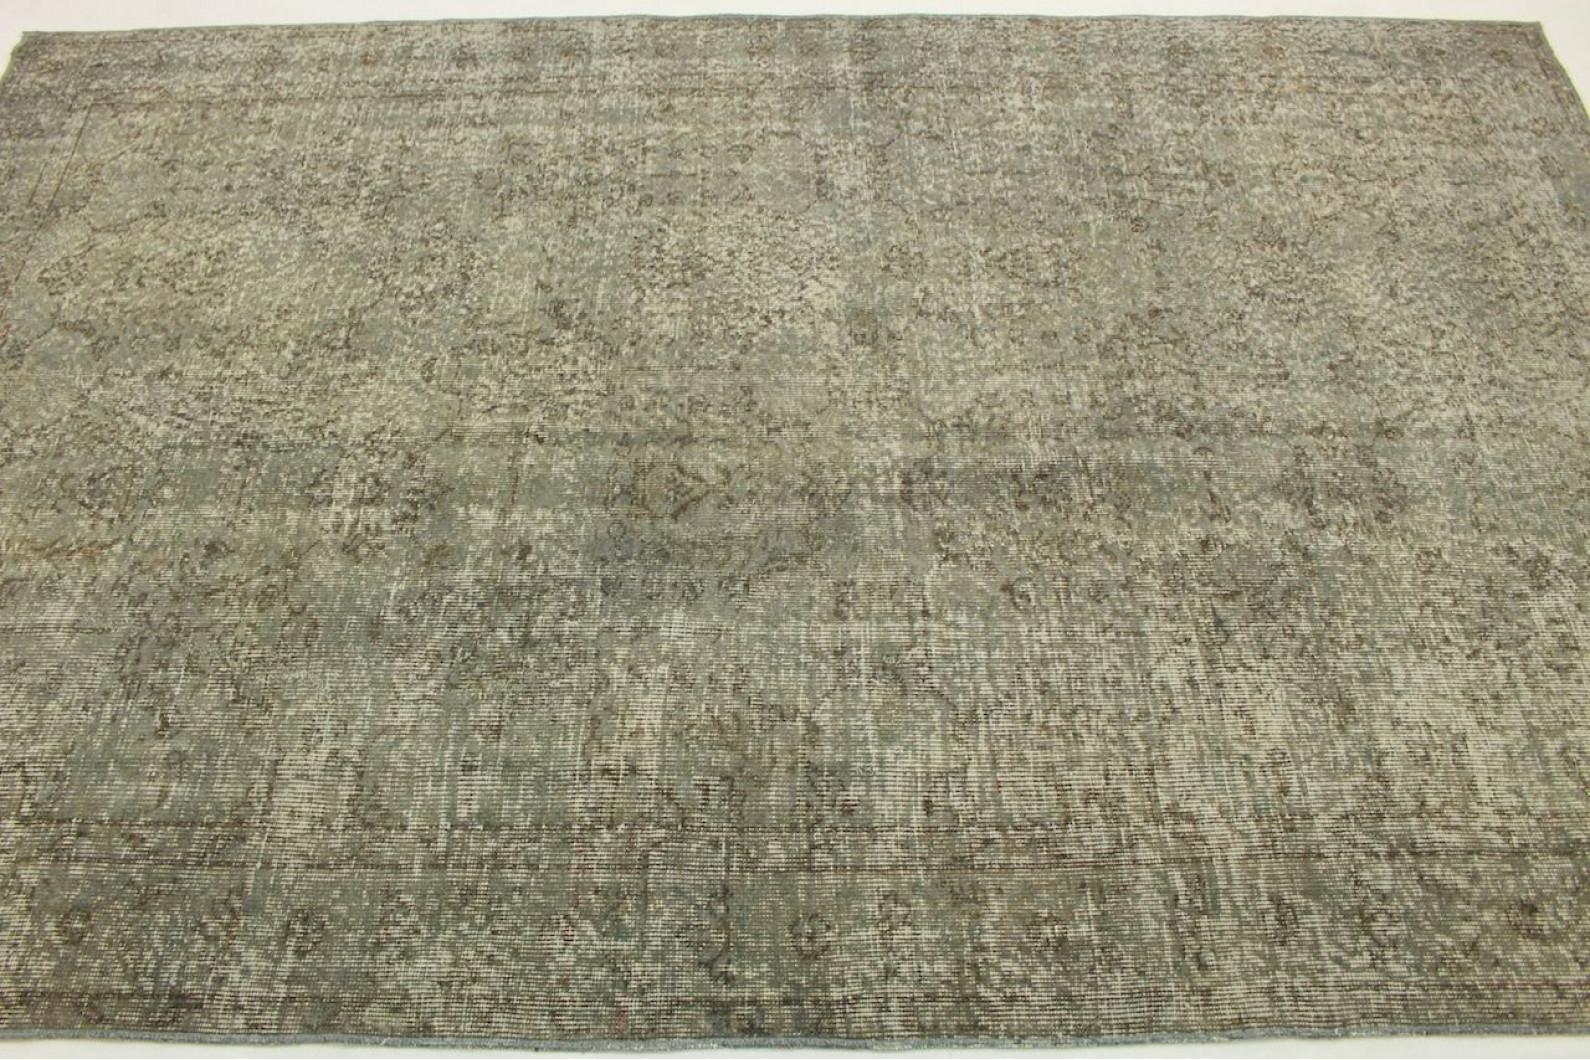 vintage teppich grau in 290x180cm 1011 2908 bei. Black Bedroom Furniture Sets. Home Design Ideas